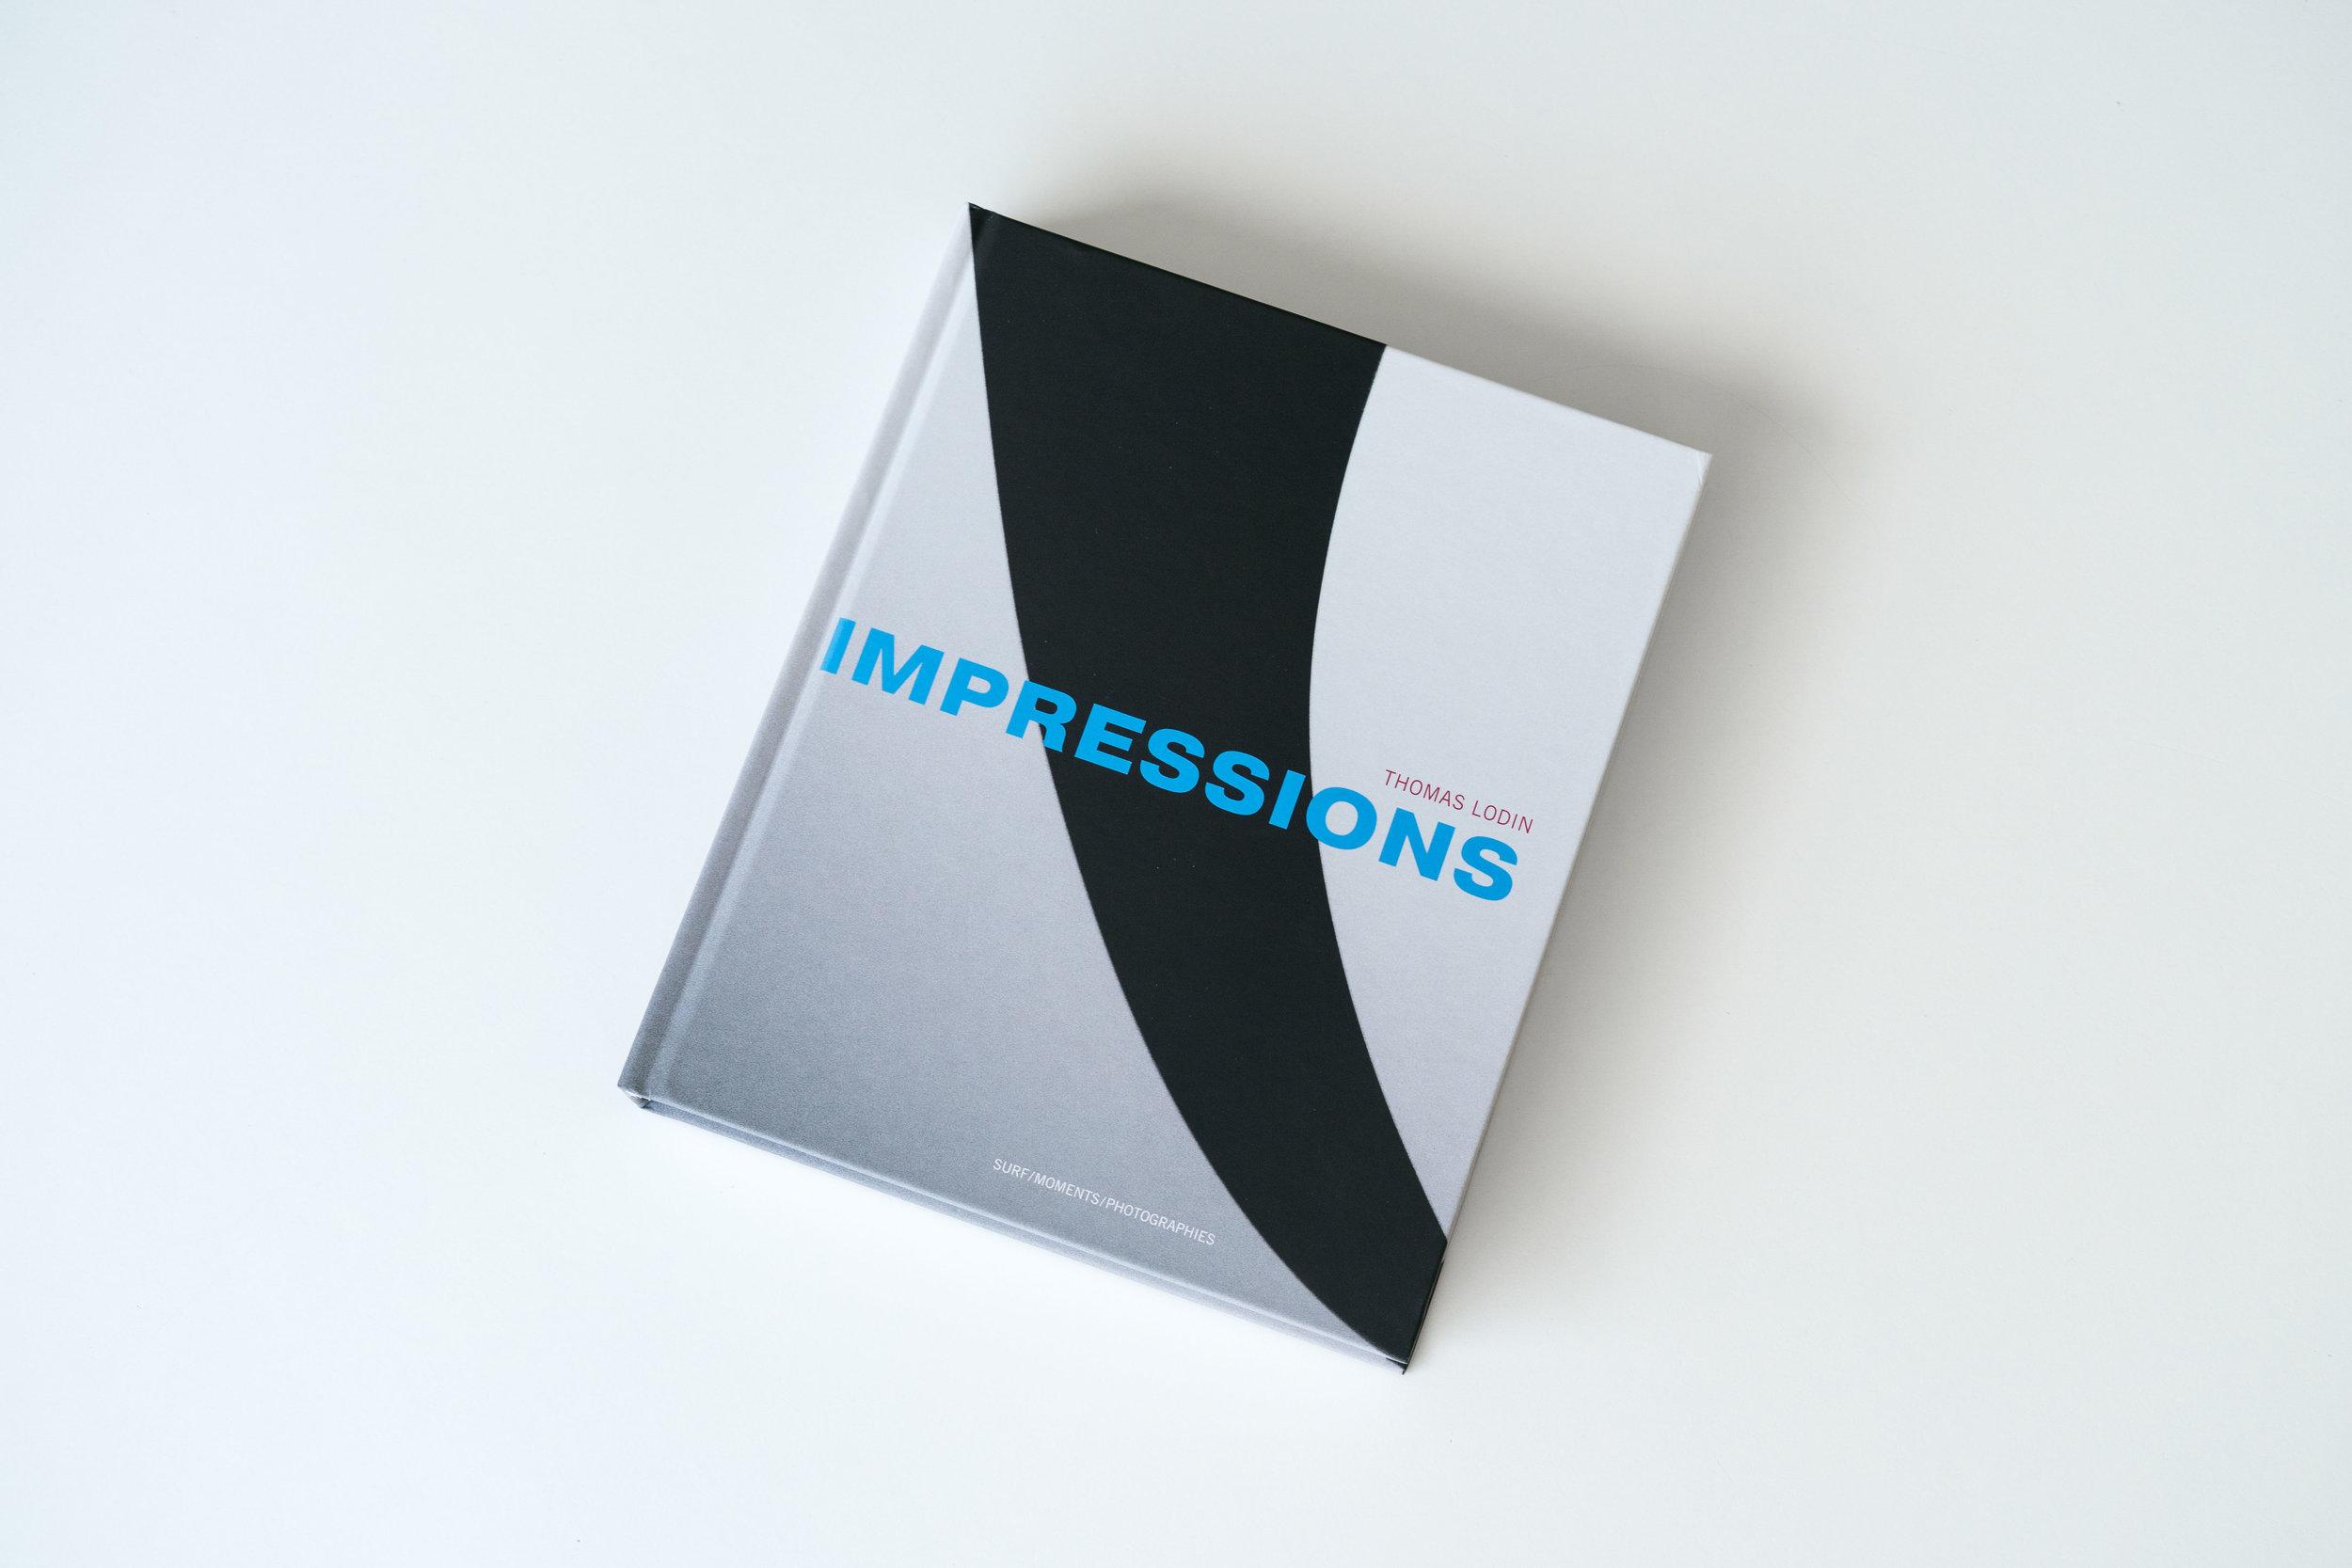 Packshot_Book-Impressions_TLodin_TL_02772.jpg